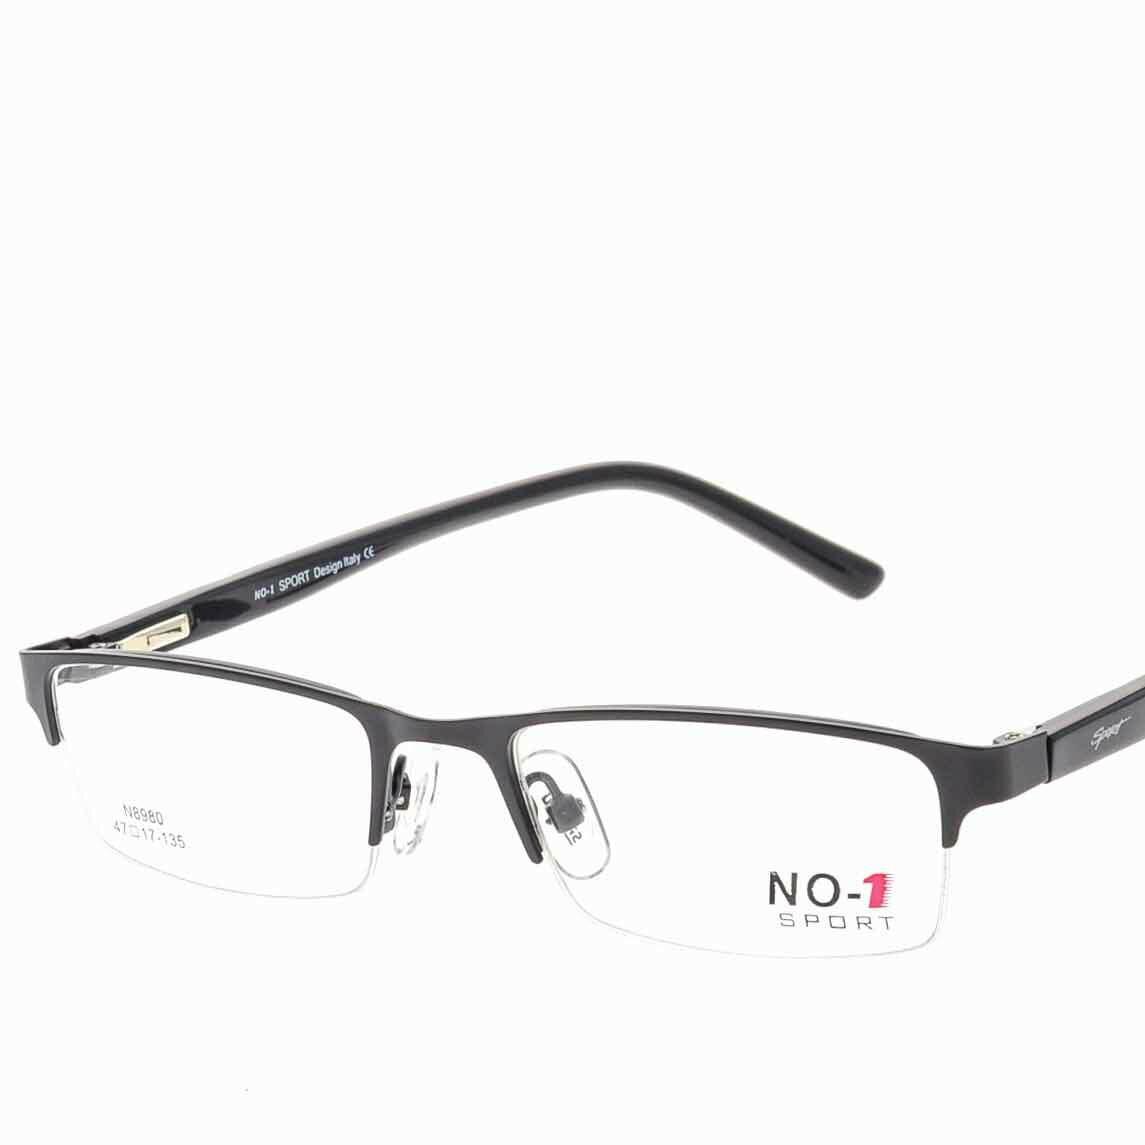 NO-1 SPORT N8980